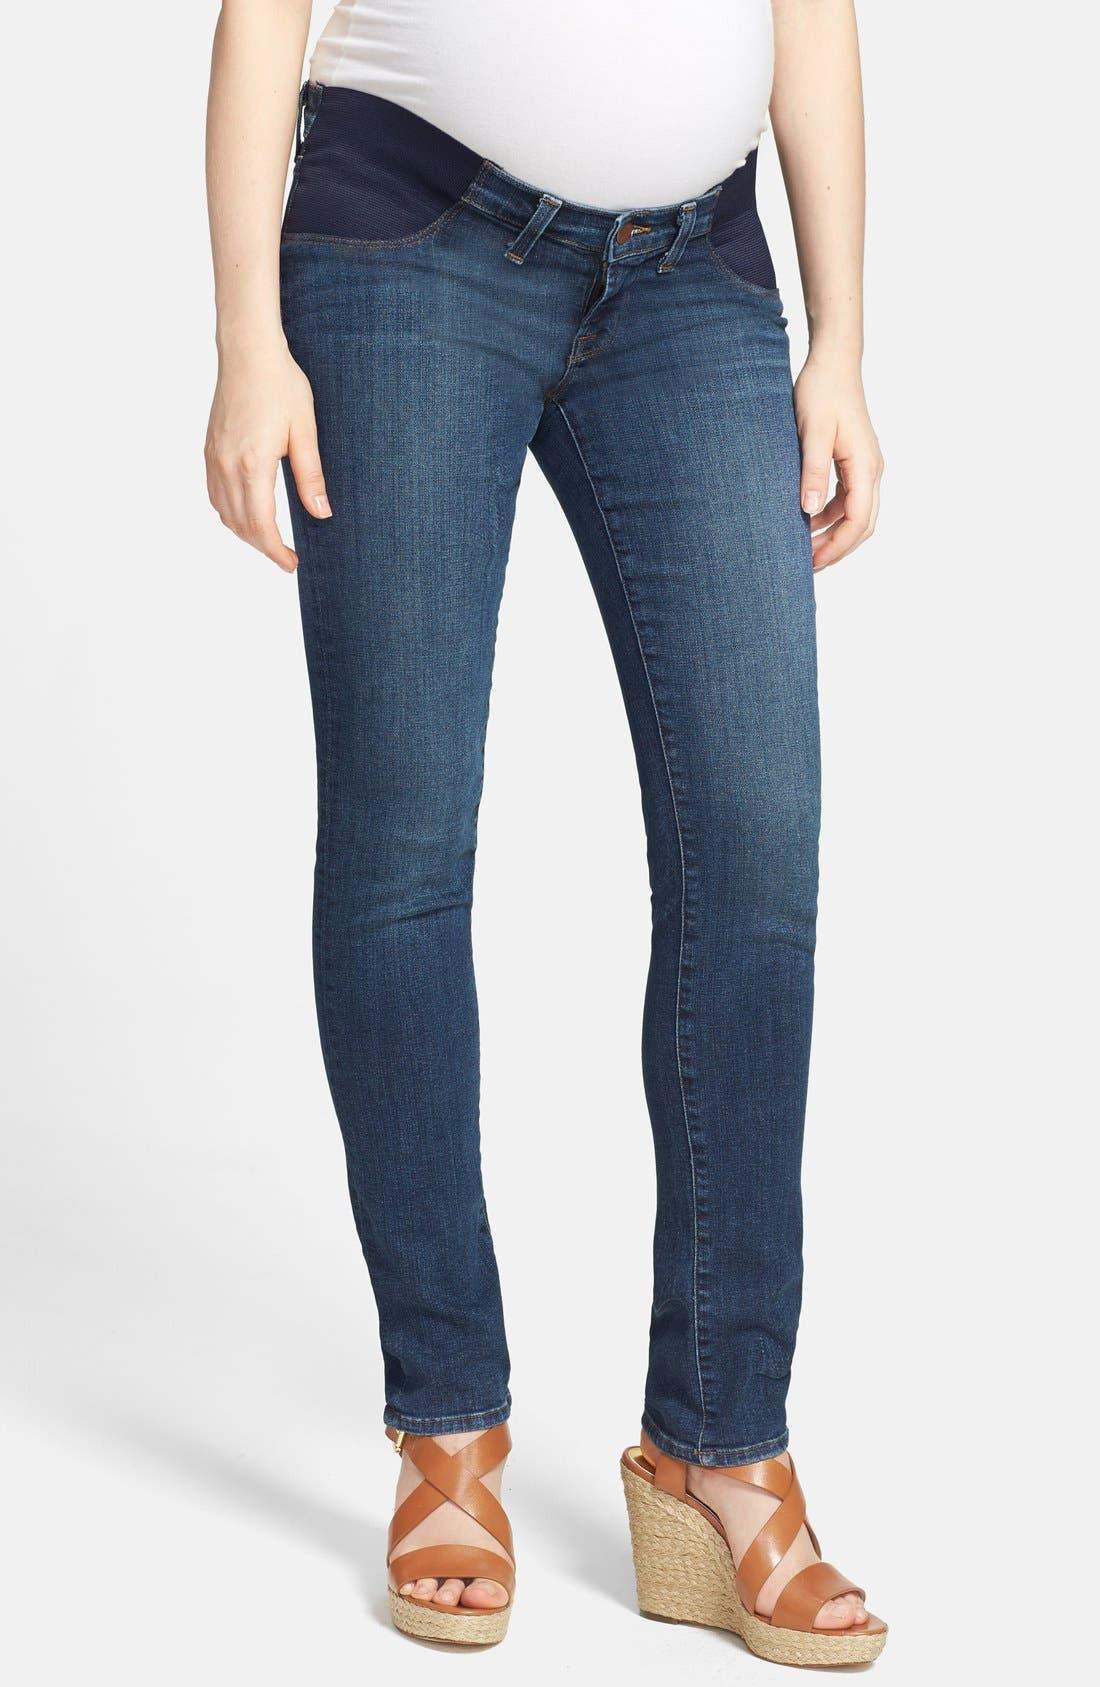 Alternate Image 1 Selected - J Brand 'Rail' Skinny Maternity Jeans (Eminence)